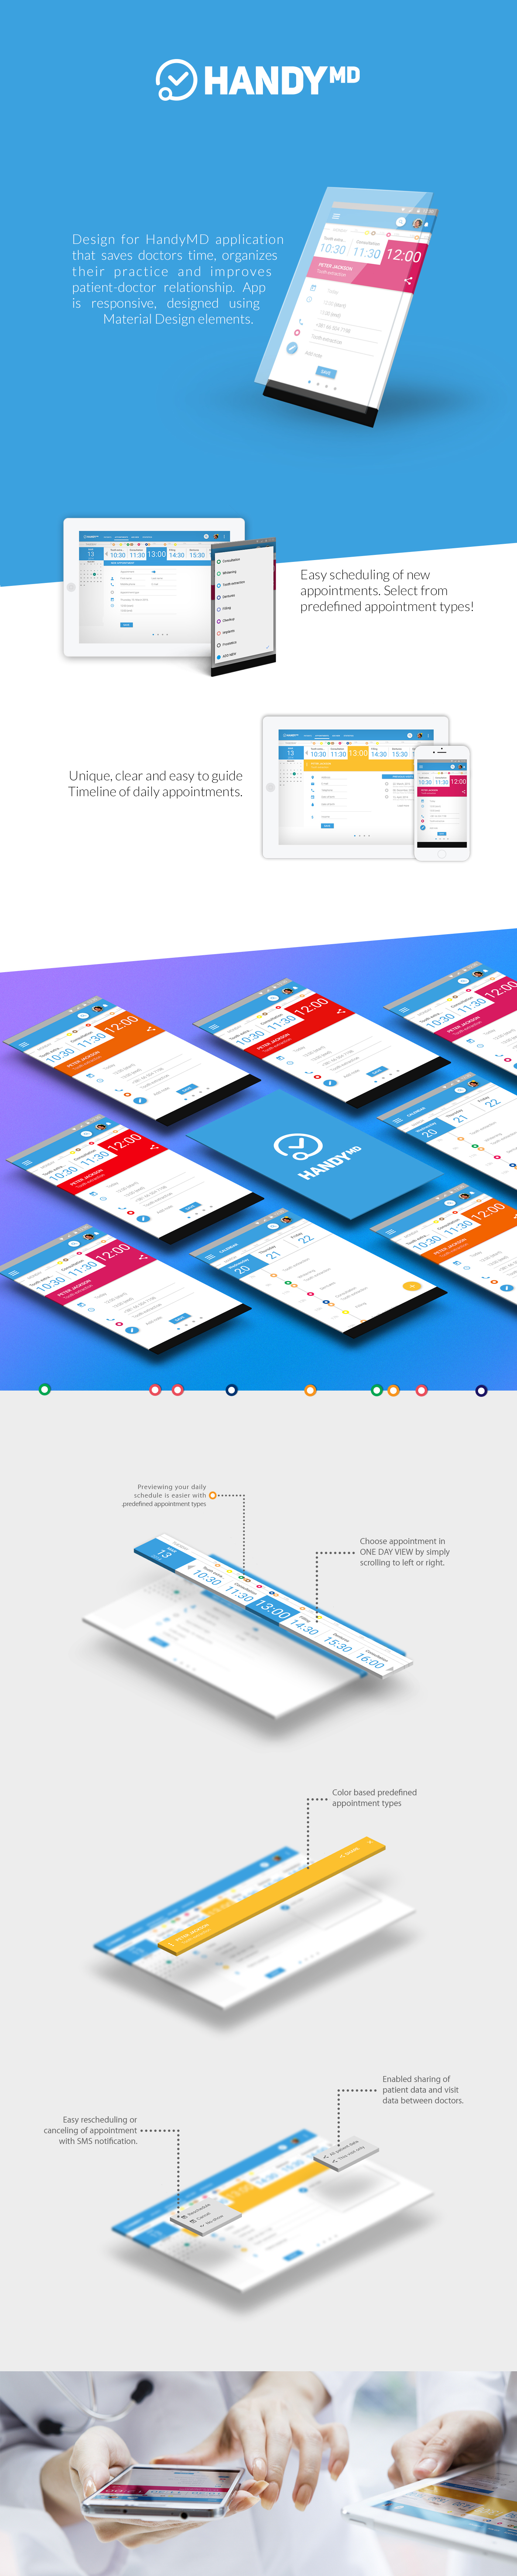 medical android UI ux user expirience user interface app design application app Application Design Medical app handy handymd Responsive Responsive Design